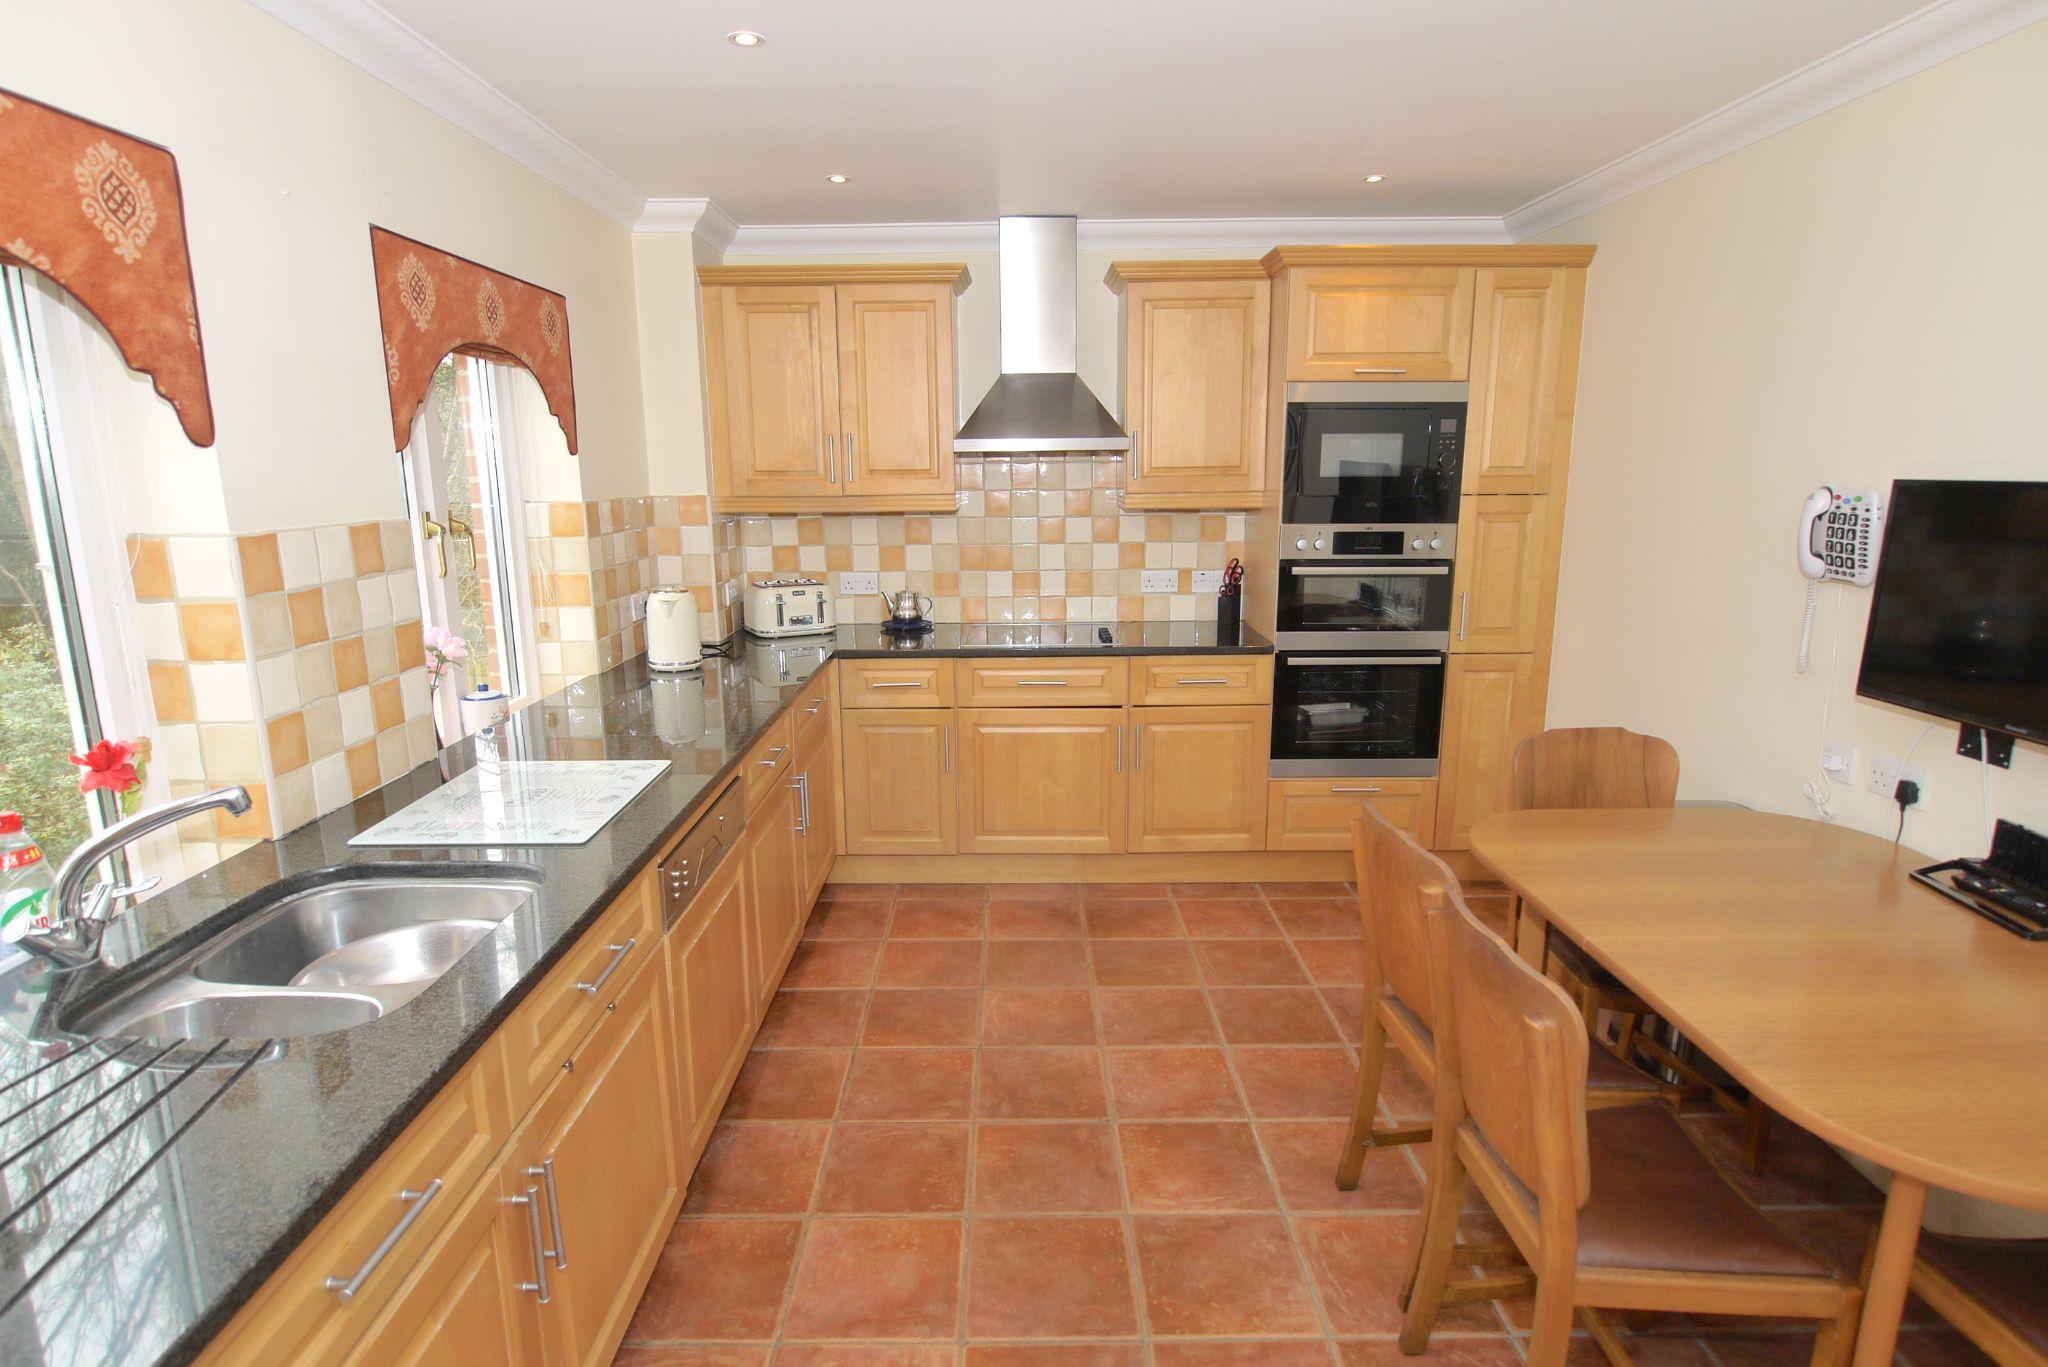 2 bedroom ground floor For Sale in Sevenoaks - Photograph 6